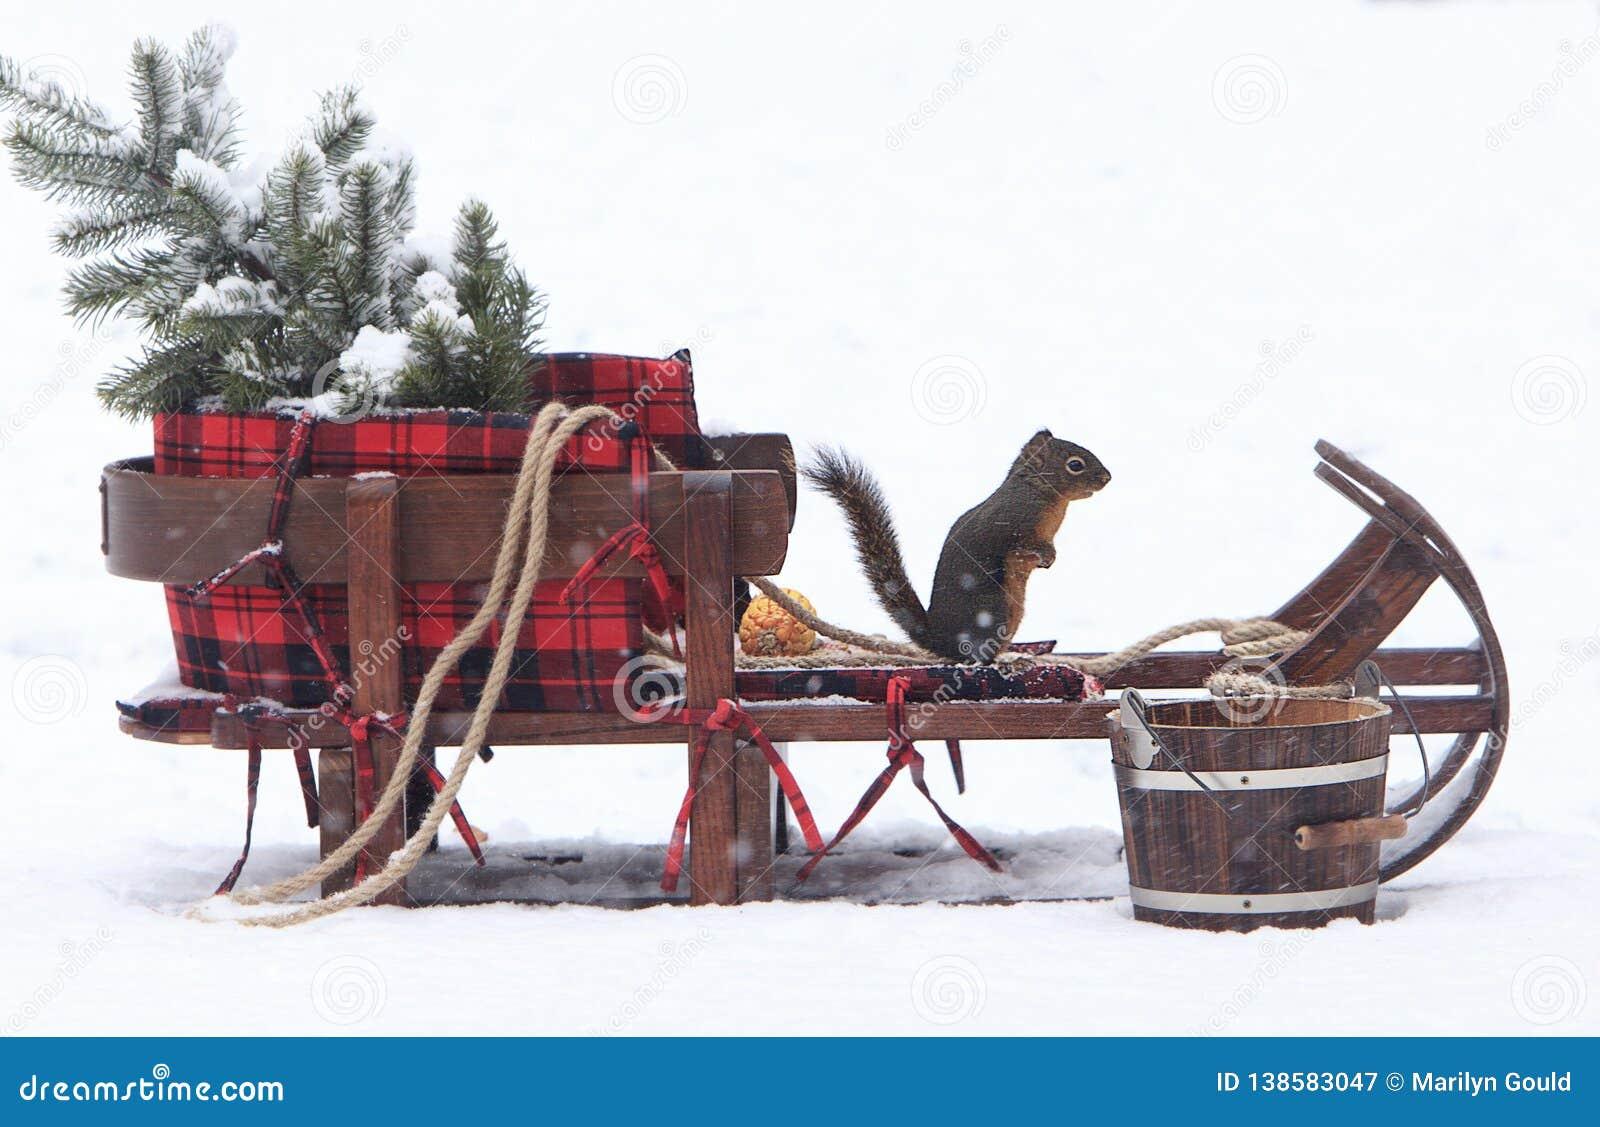 Douglas Squirrel on Christmas Sleigh 2